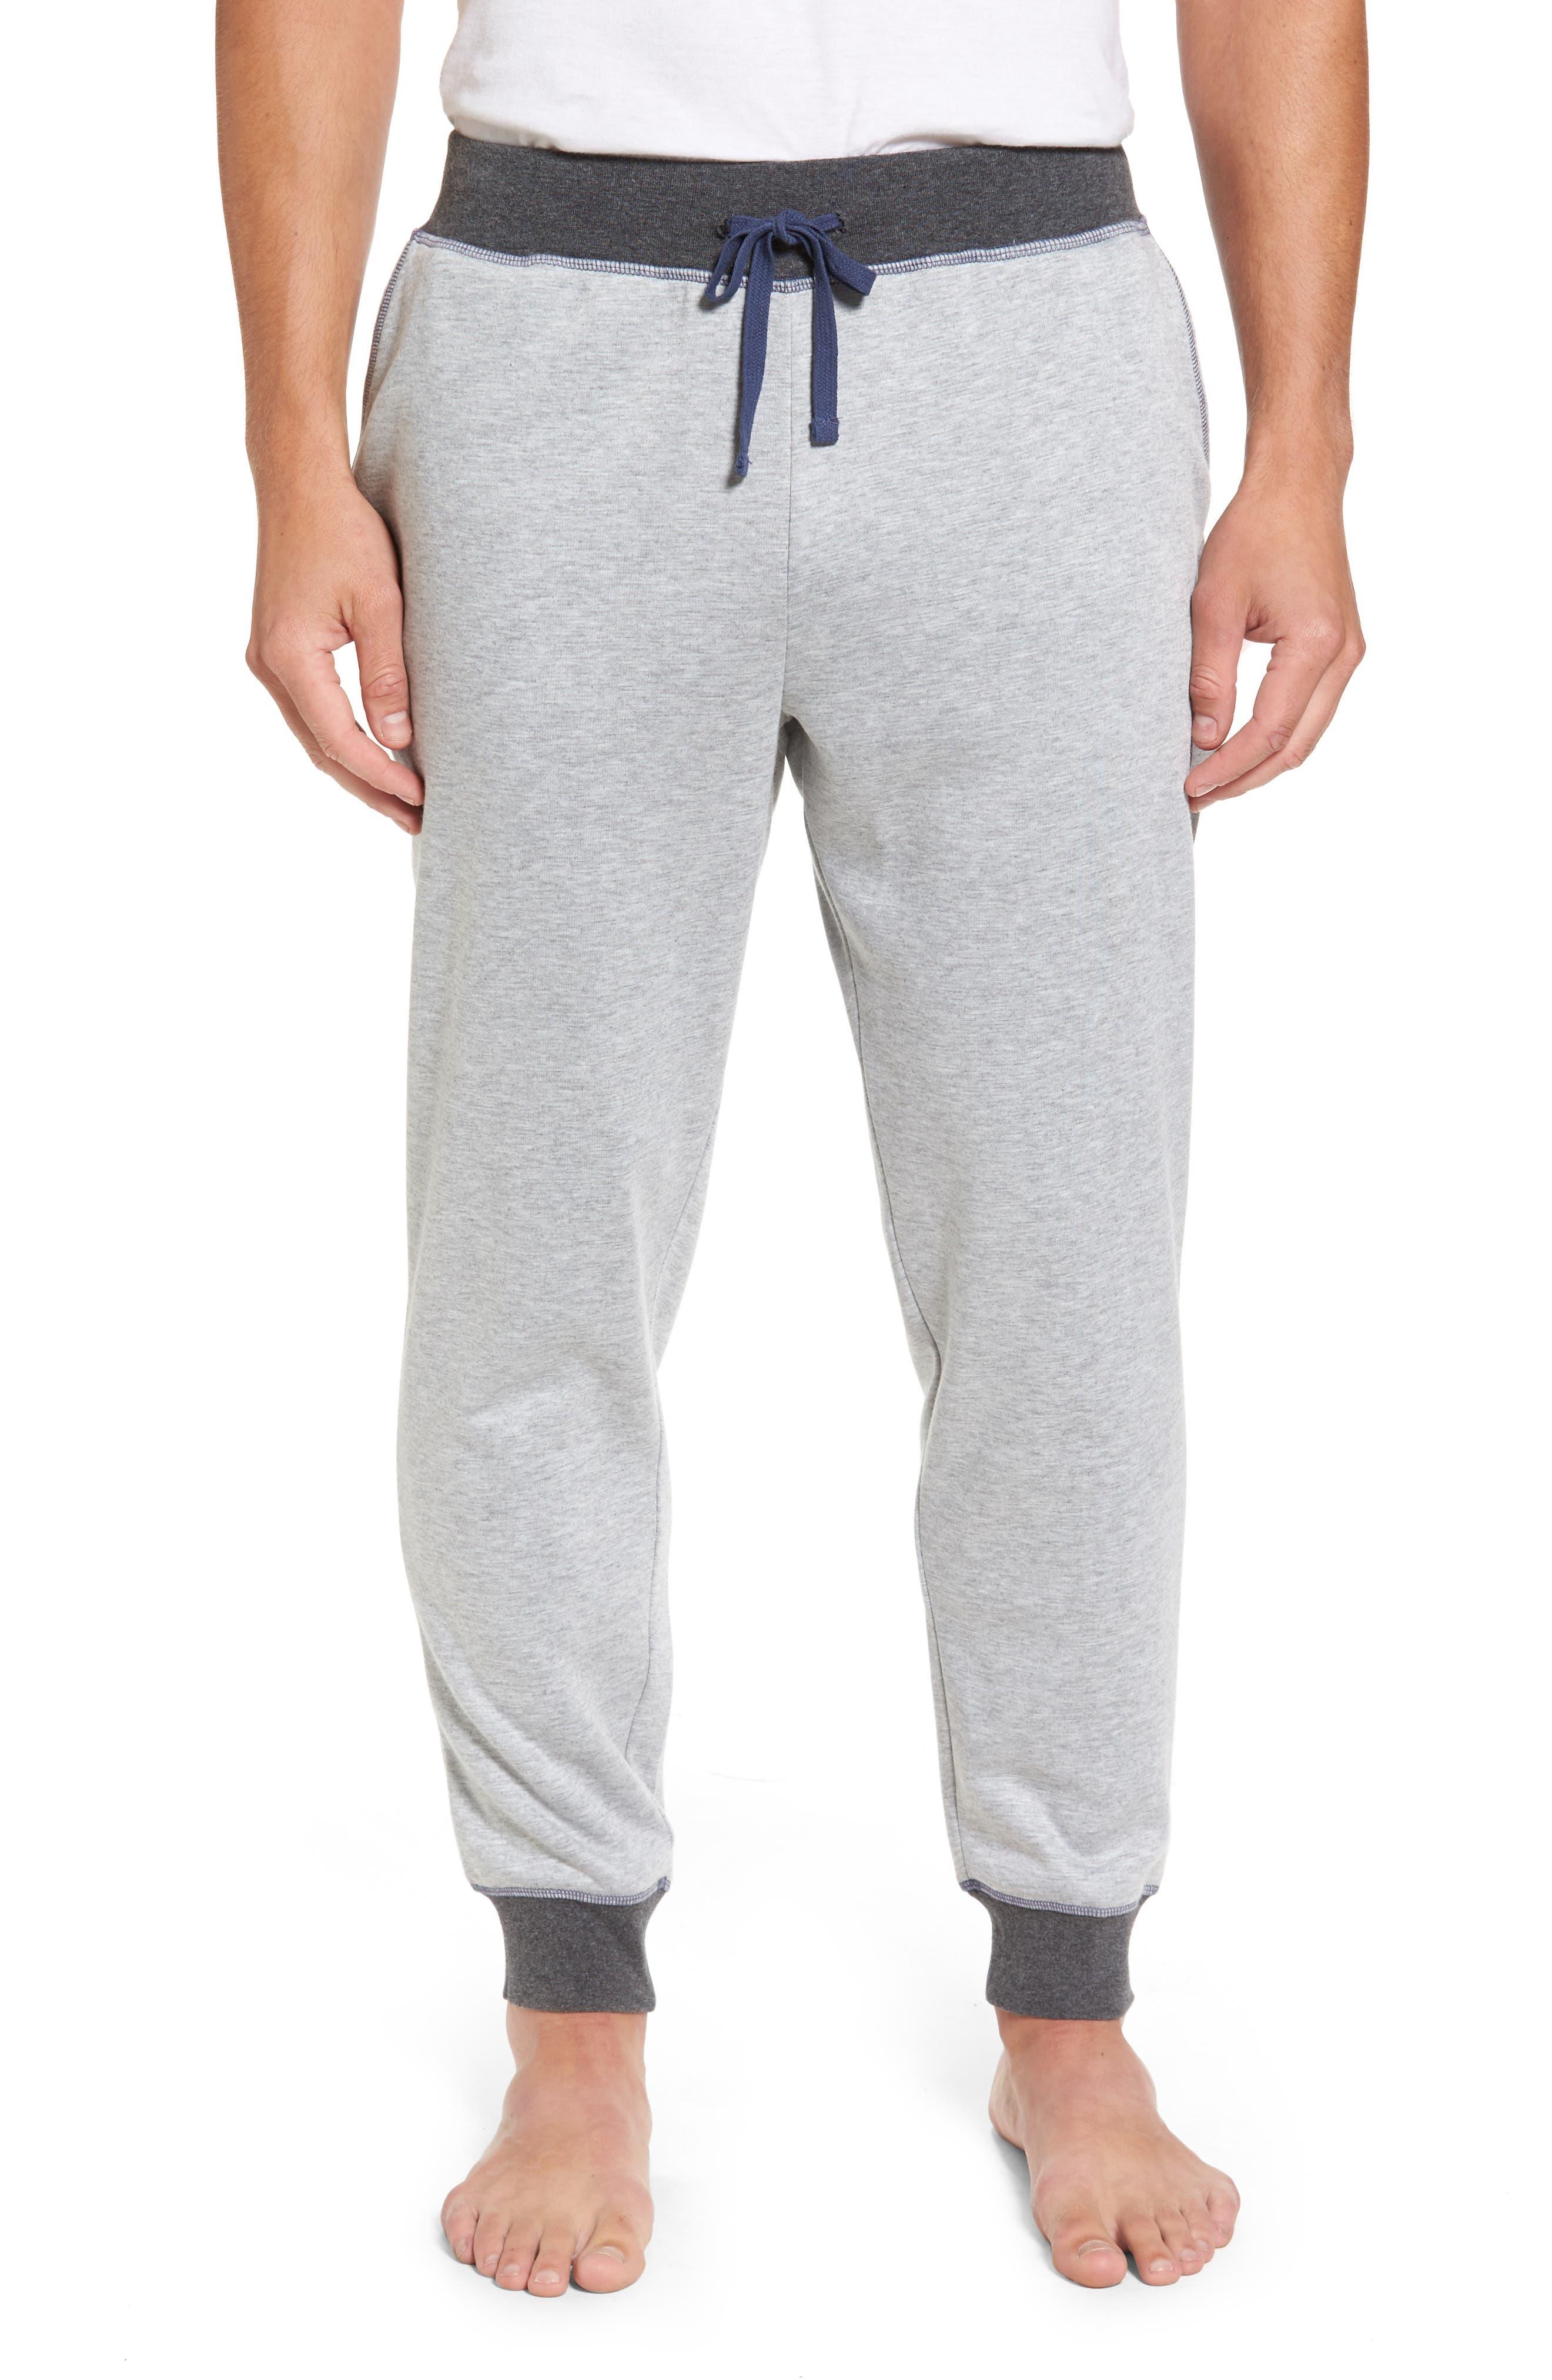 Double Take Knit Lounge Pants,                         Main,                         color, 025